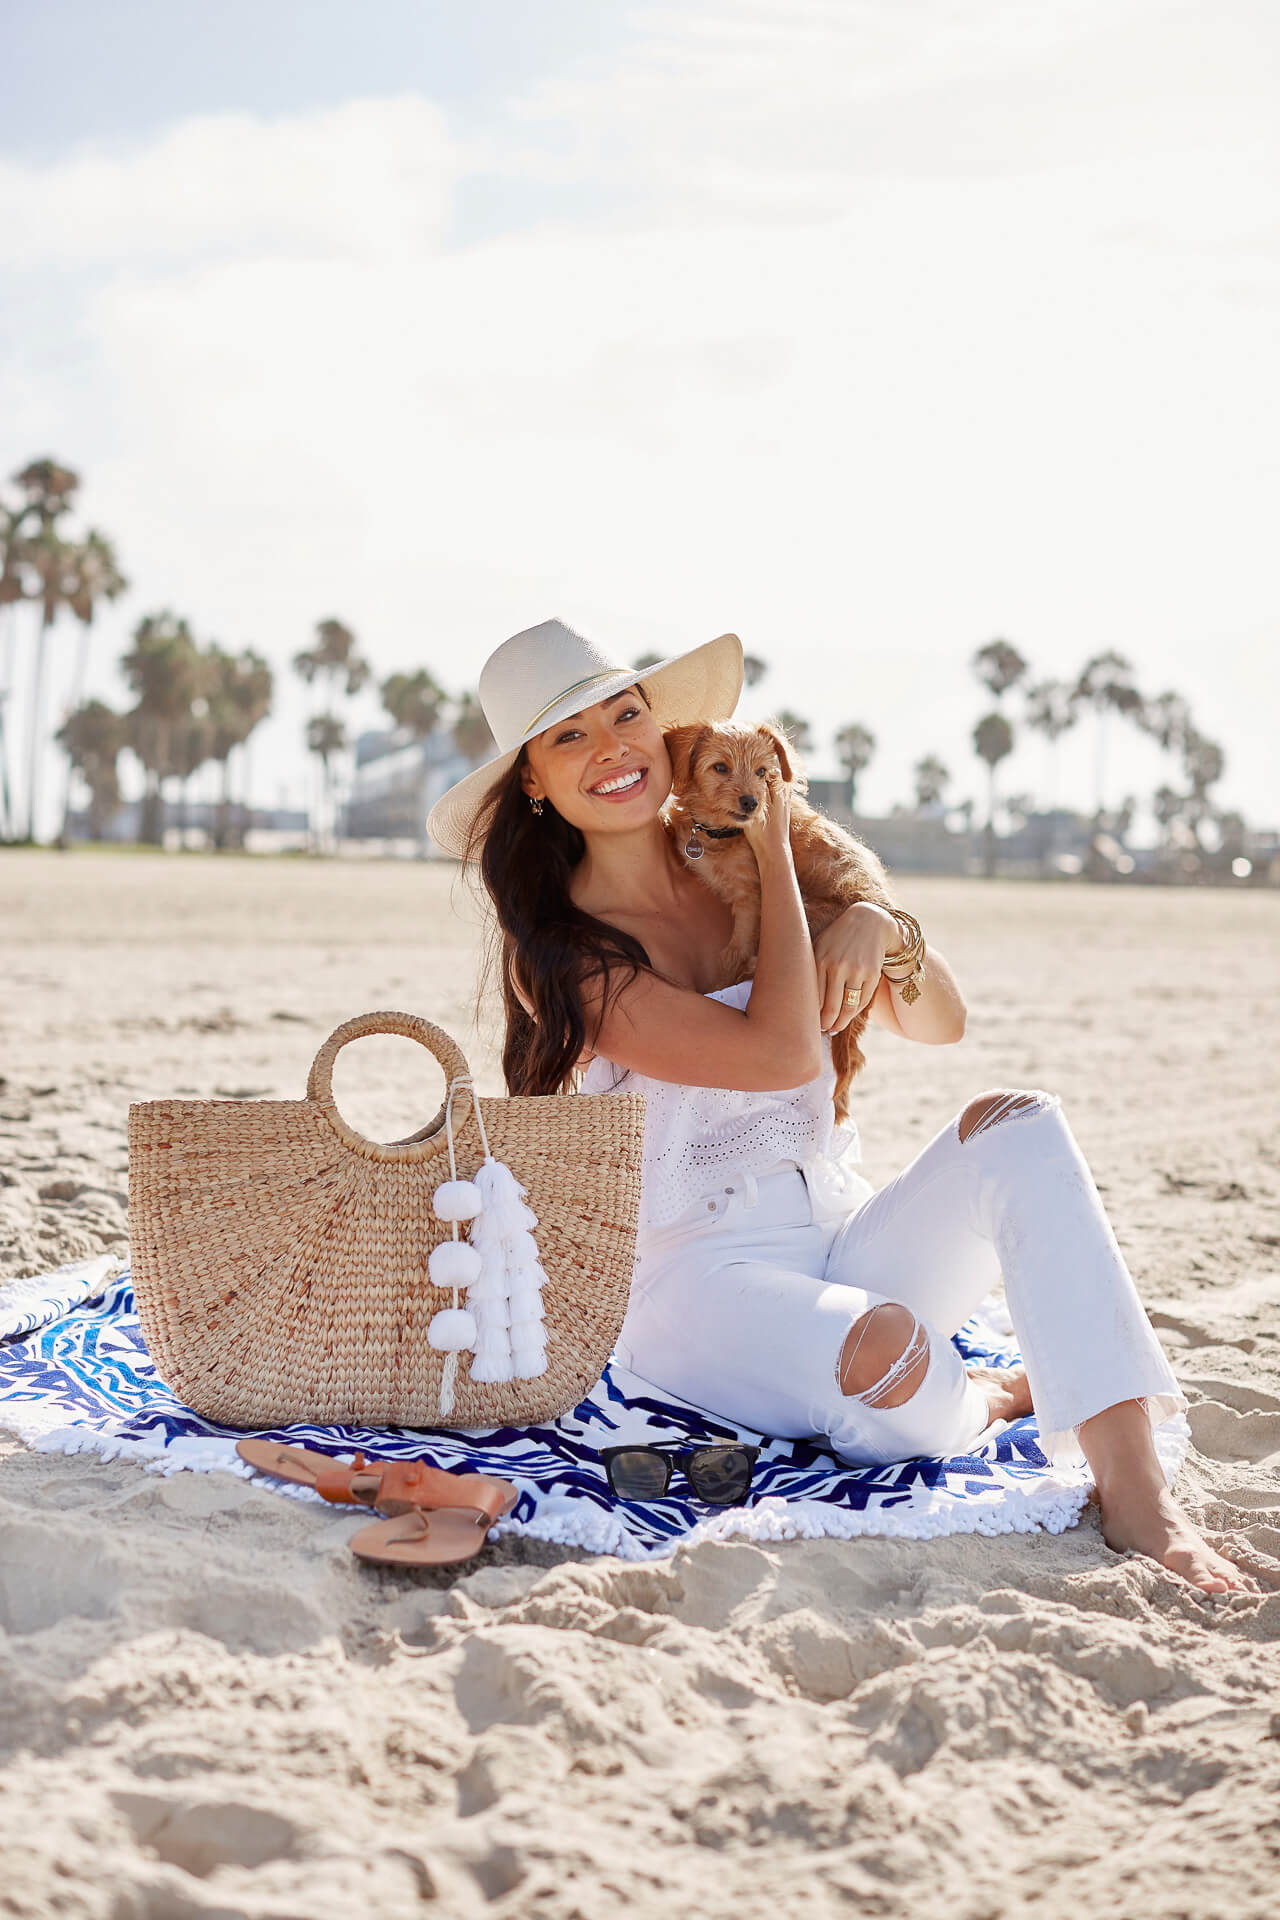 Kat Tanita gives her best Venice Beach tips! - M Loves M @marmar